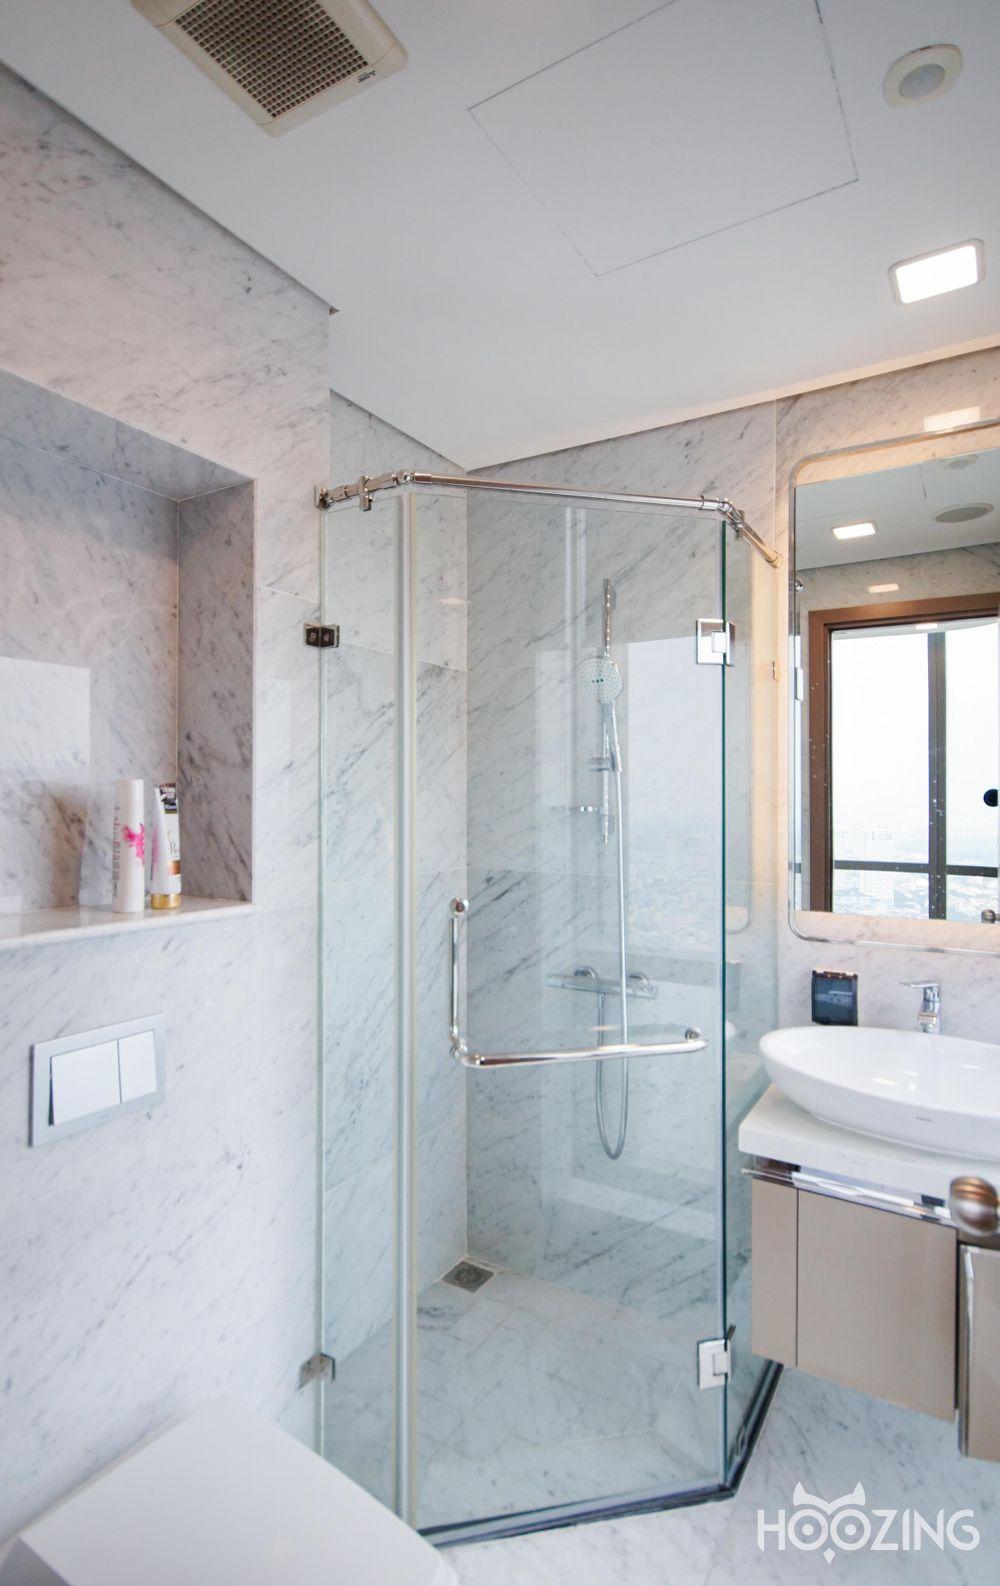 Landmark 81  - Vinhomes Central Park Apartment 3 Bedrooms - Basic Furnished & Spacious